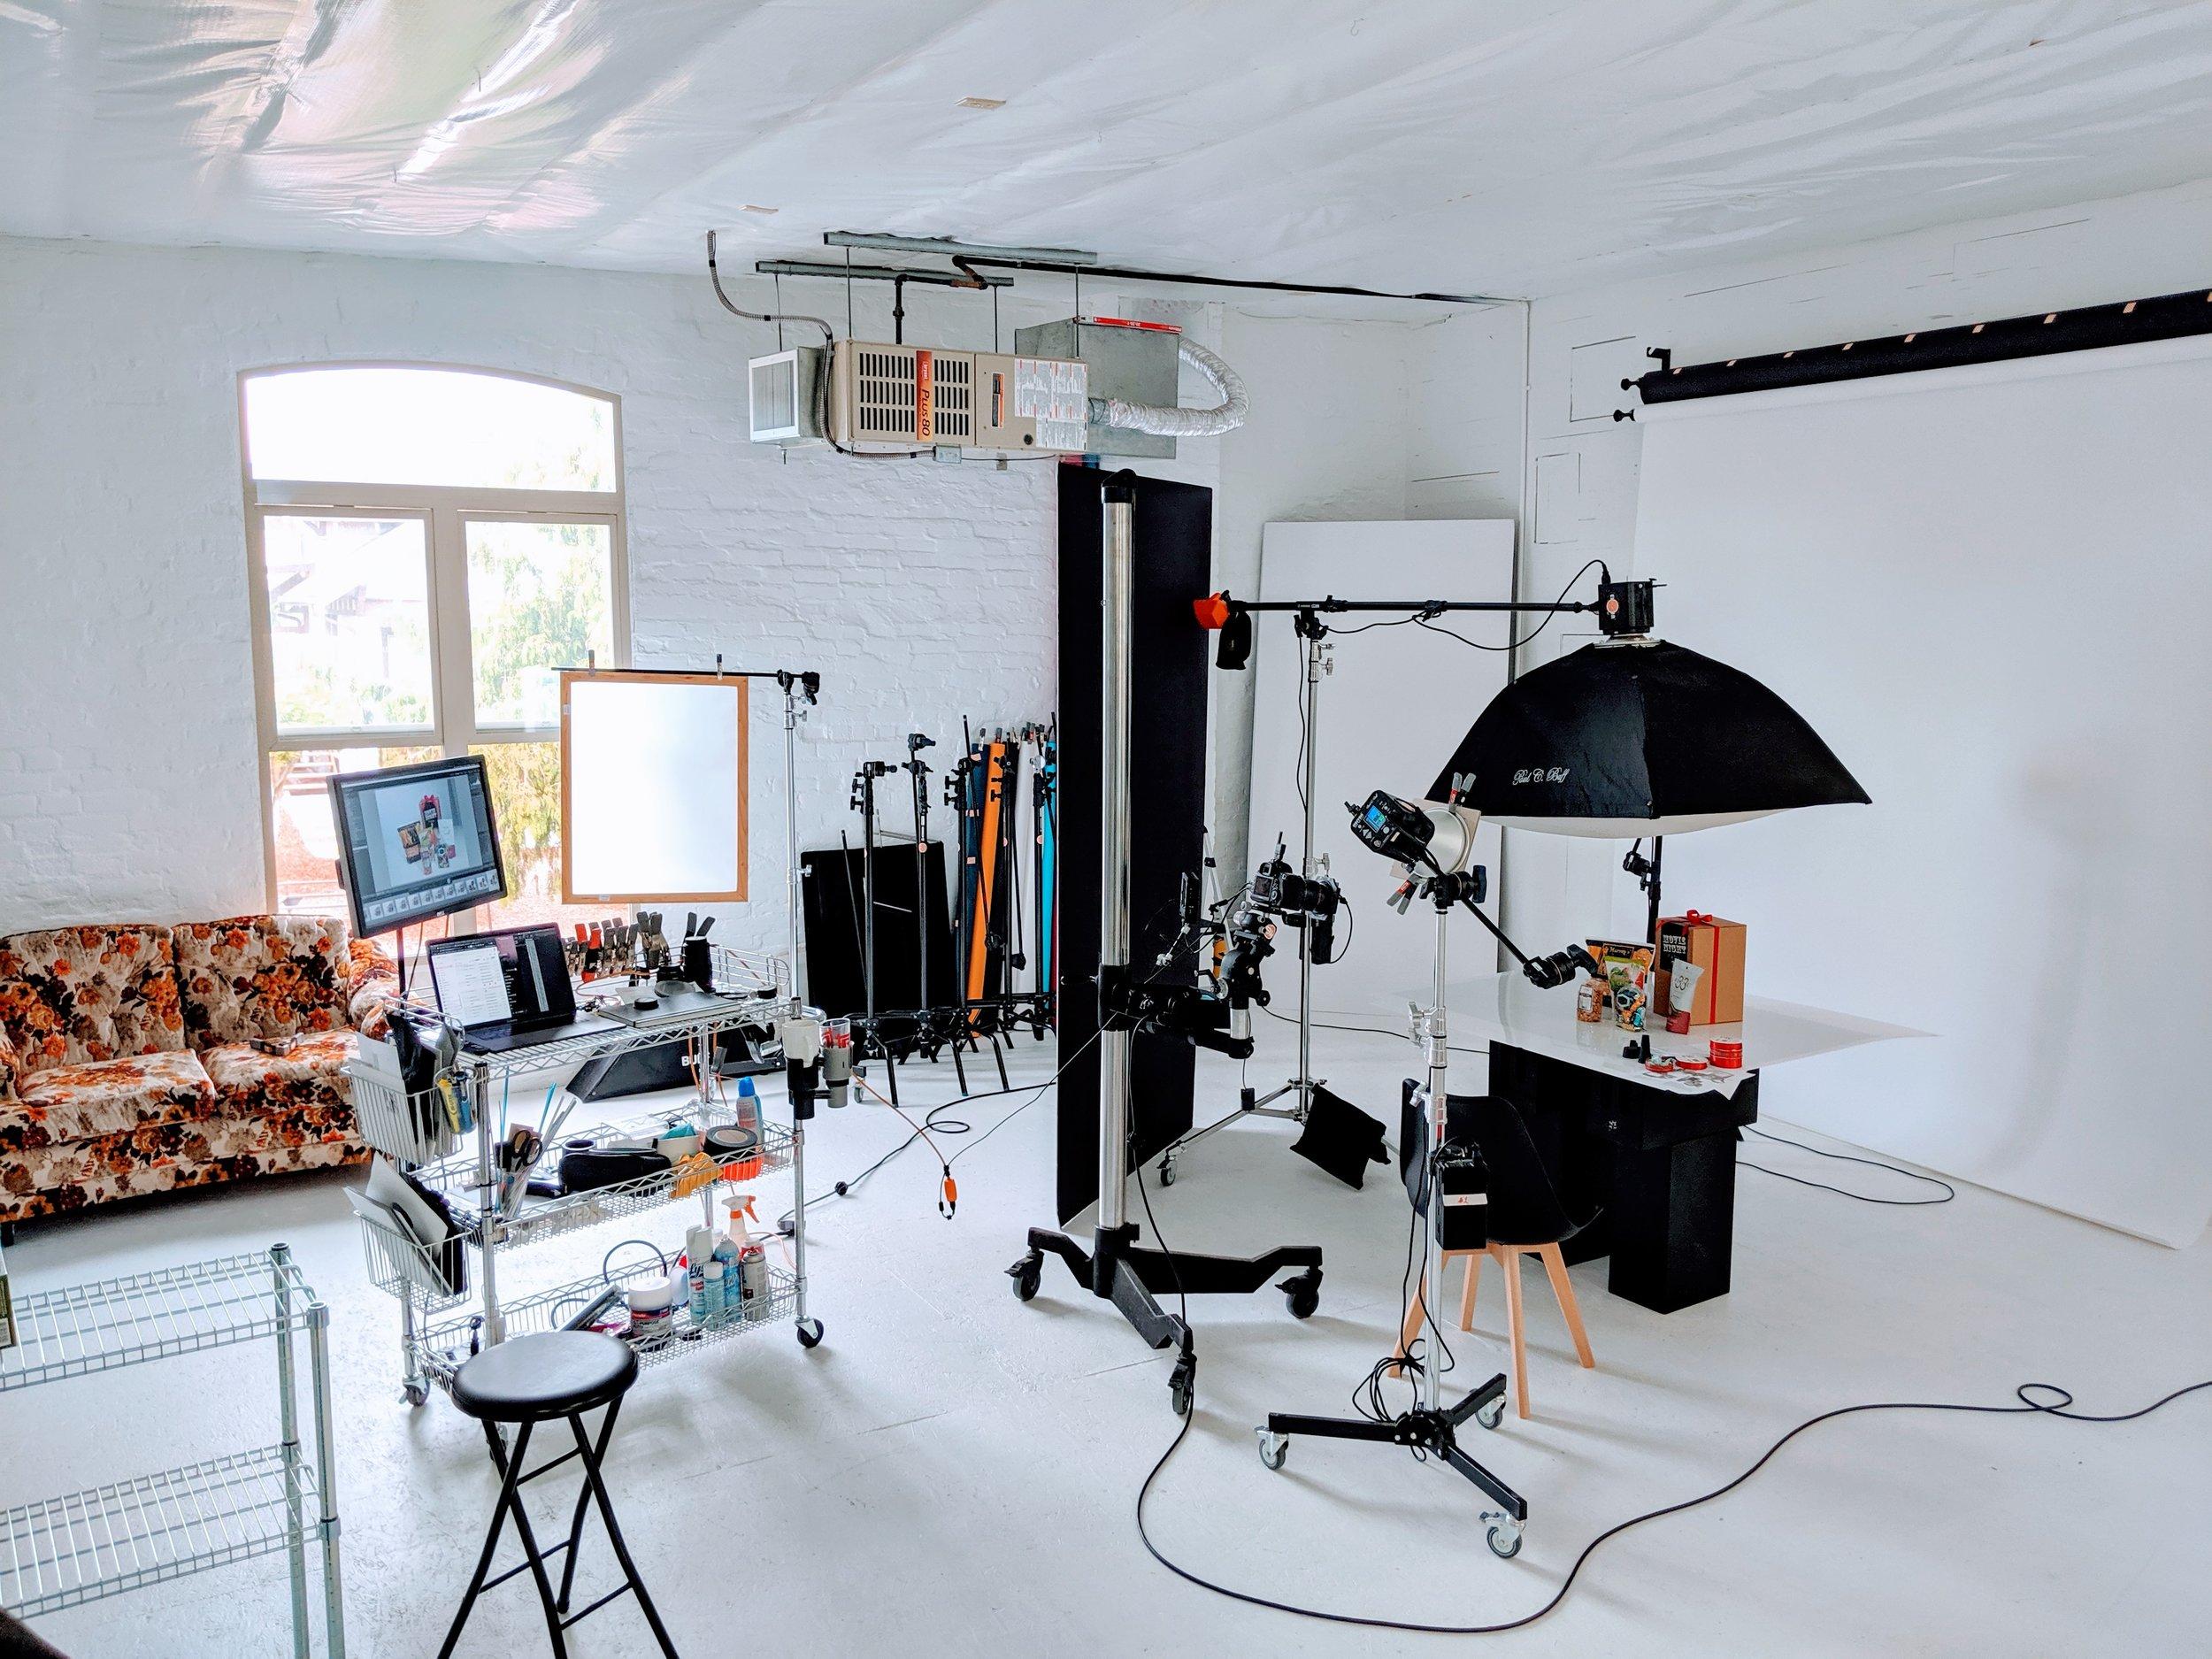 Everett-Snohimsh-photo-video-rental-studio-1.jpg